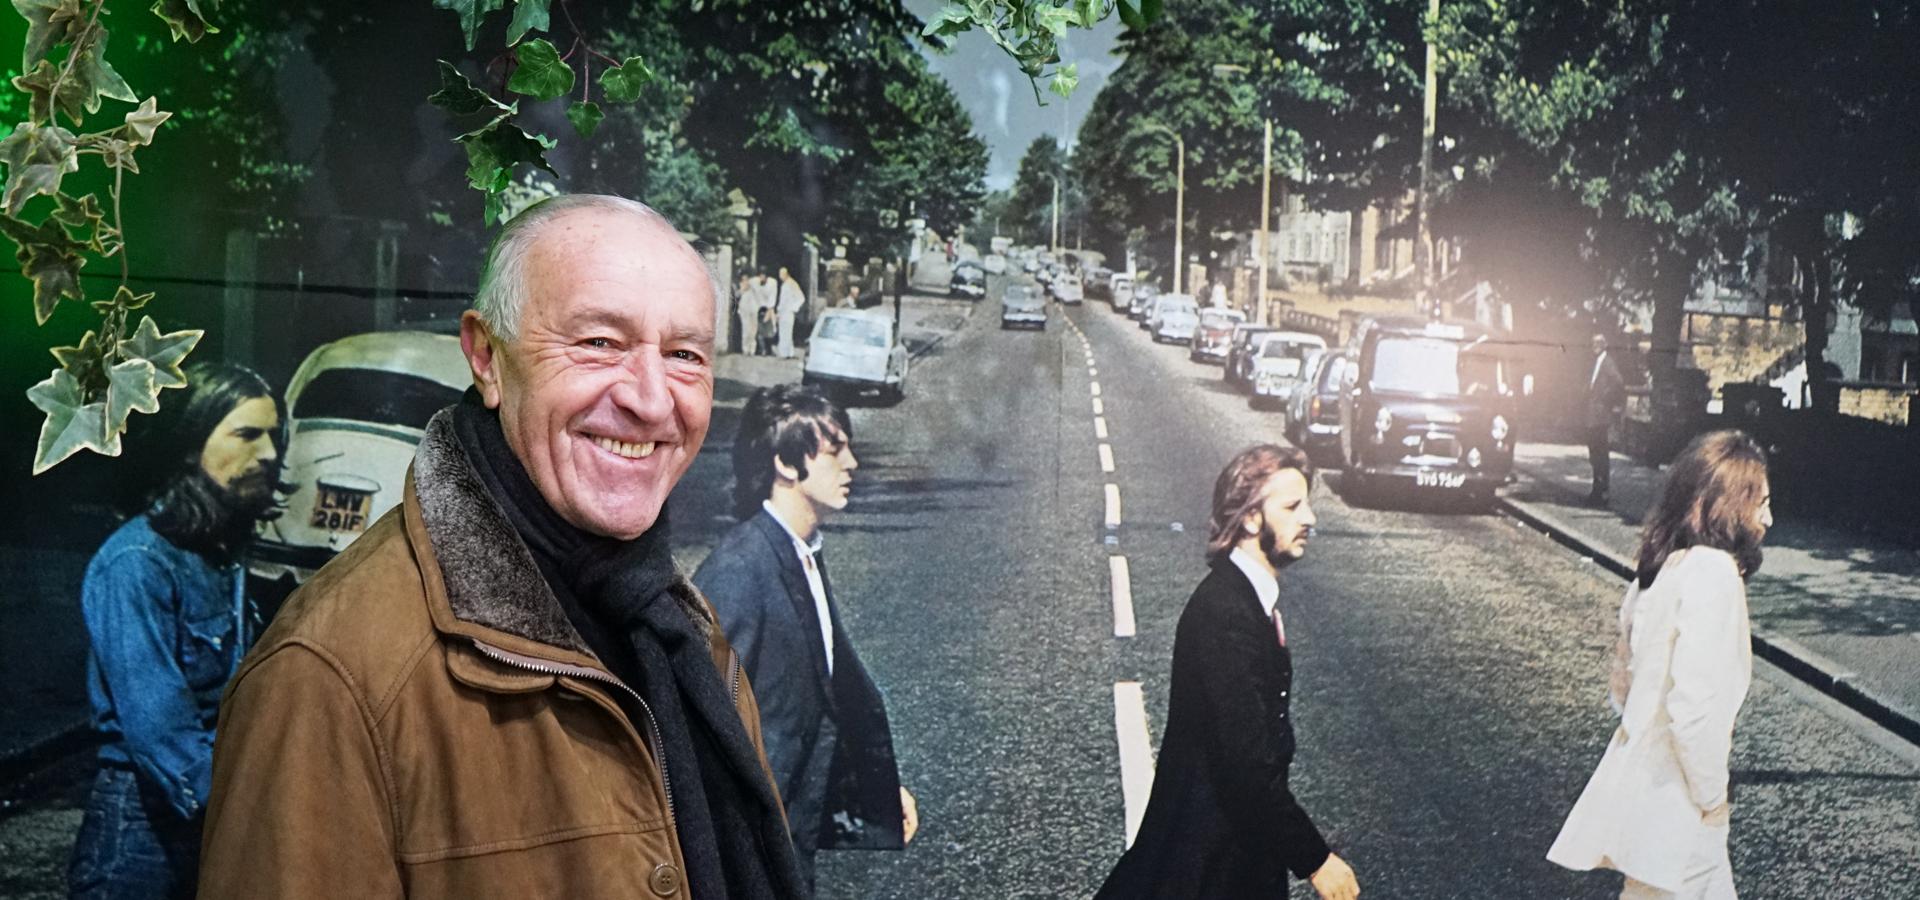 Dance With You: Len Goodman visits